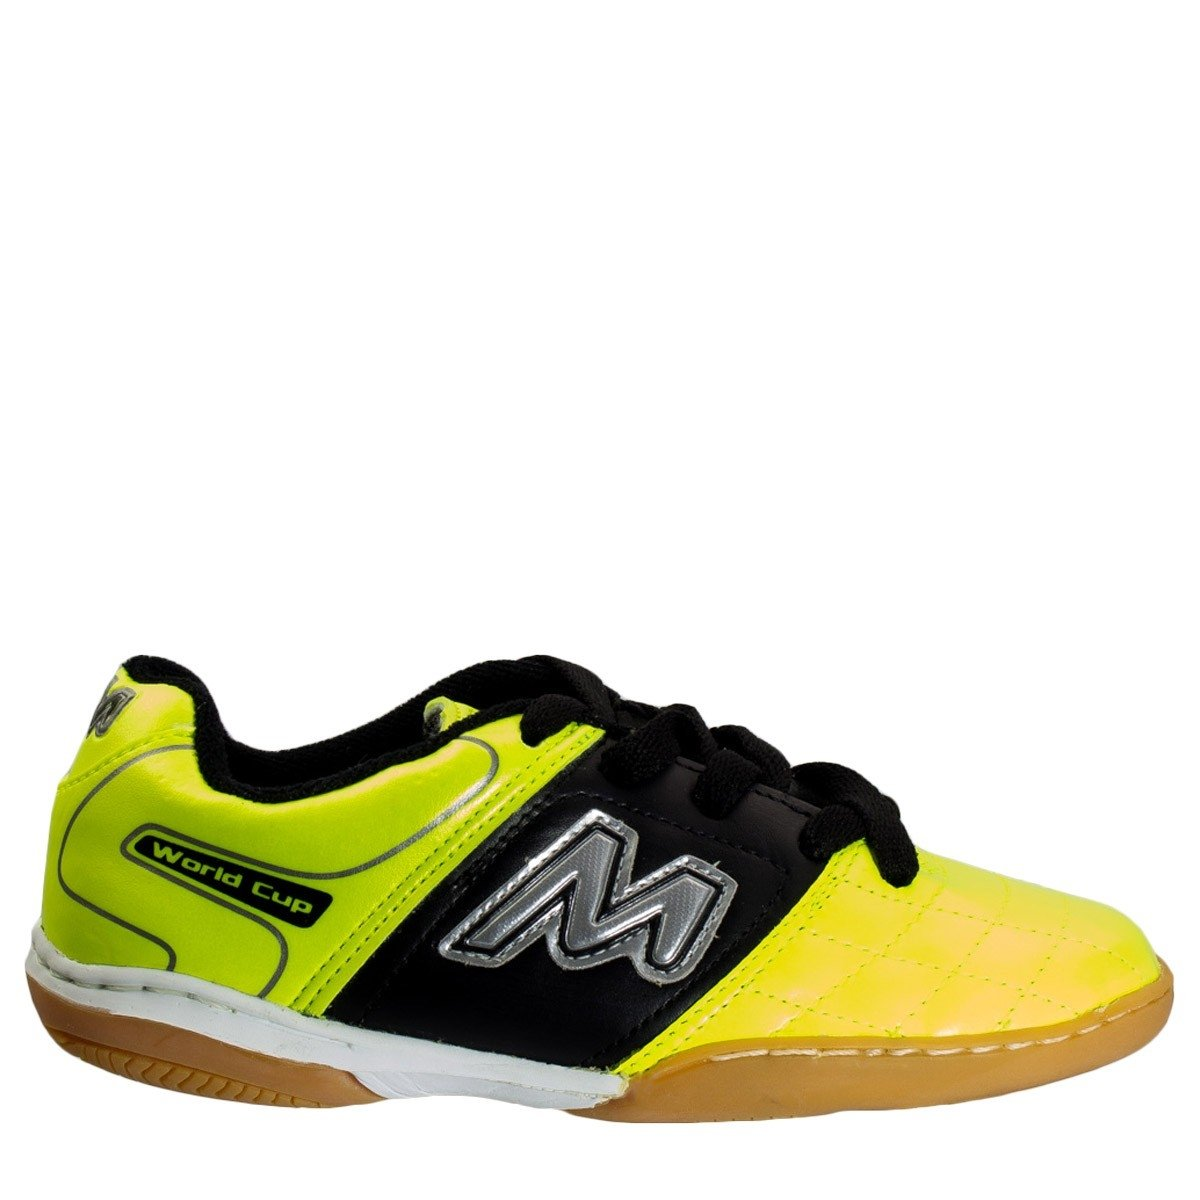 1007713875135 Chuteira Amarelo Chuteira Mathaus Futsal Futsal Chuteira  Futsal Infantil 1007713875135 Infantil Mathaus Amarelo Itália Infantil ... 6c1cd781878ce